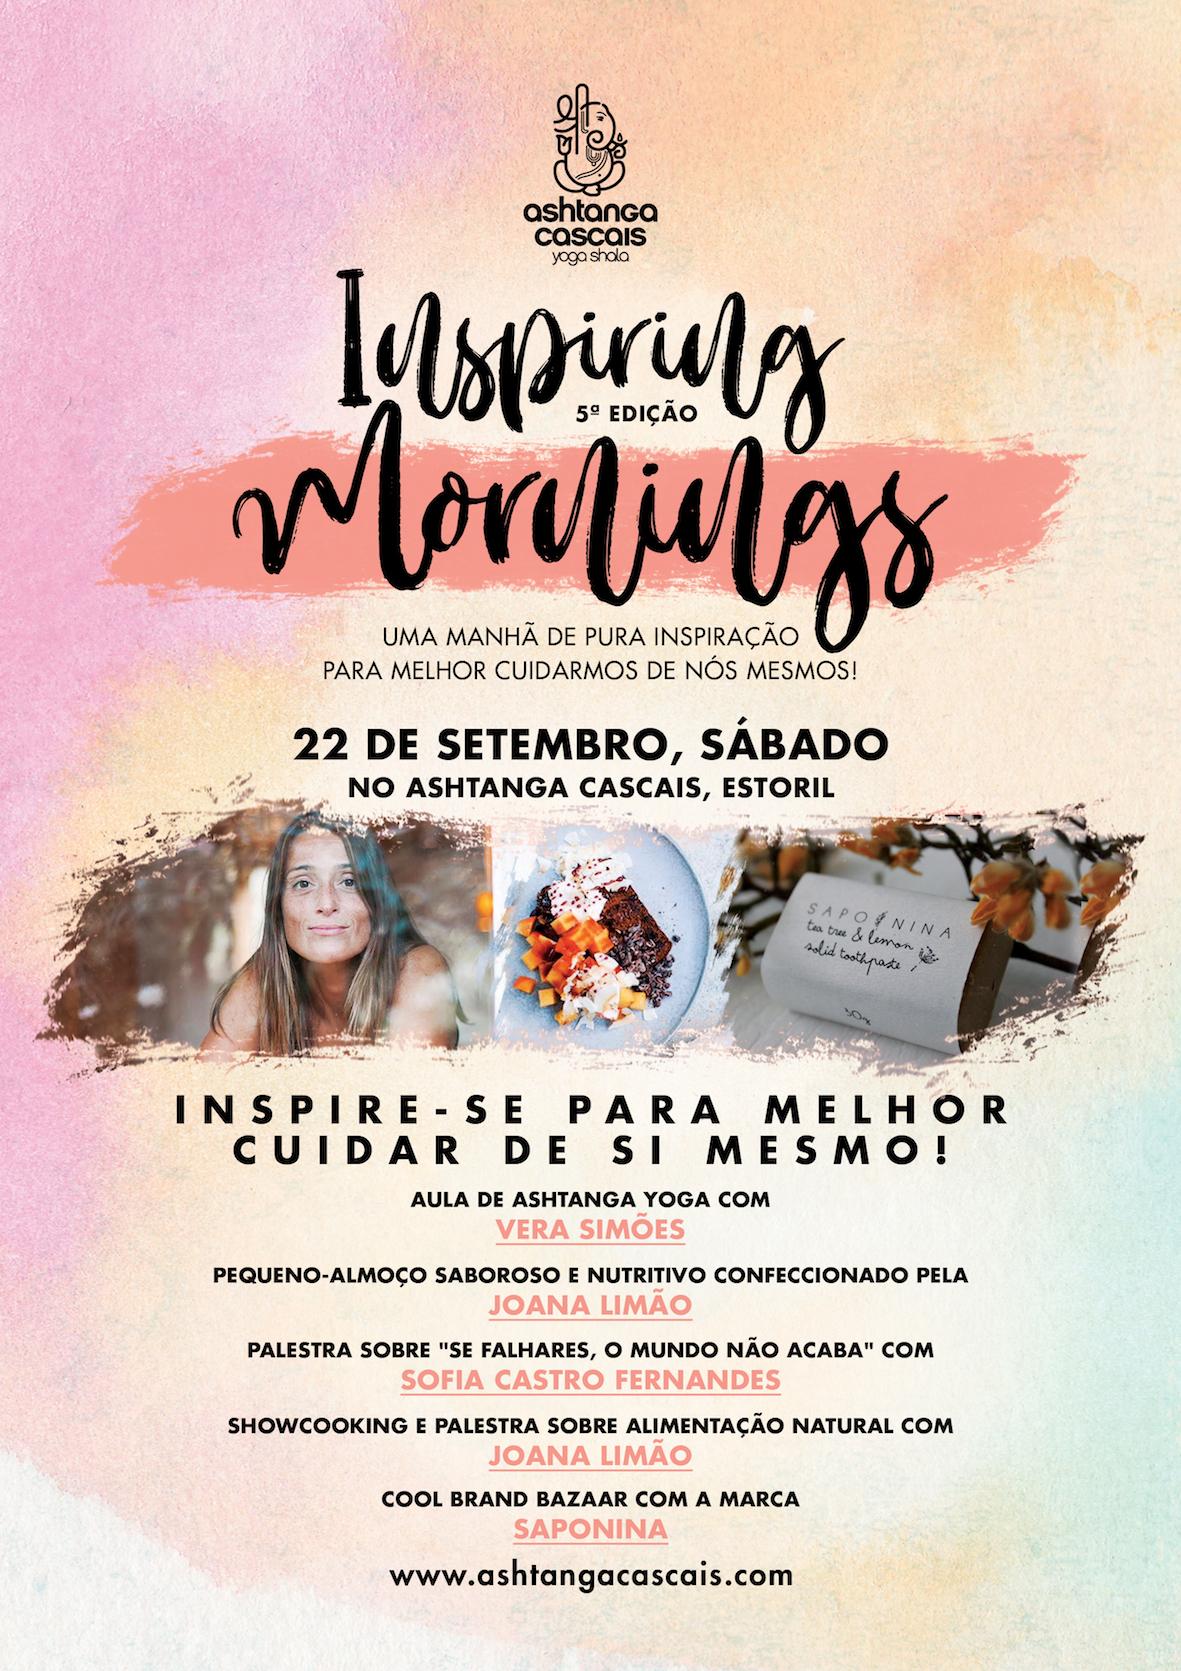 Inspiring Mornings, dia 22 de Setembro, no Ashtanga Cascais, Estoril